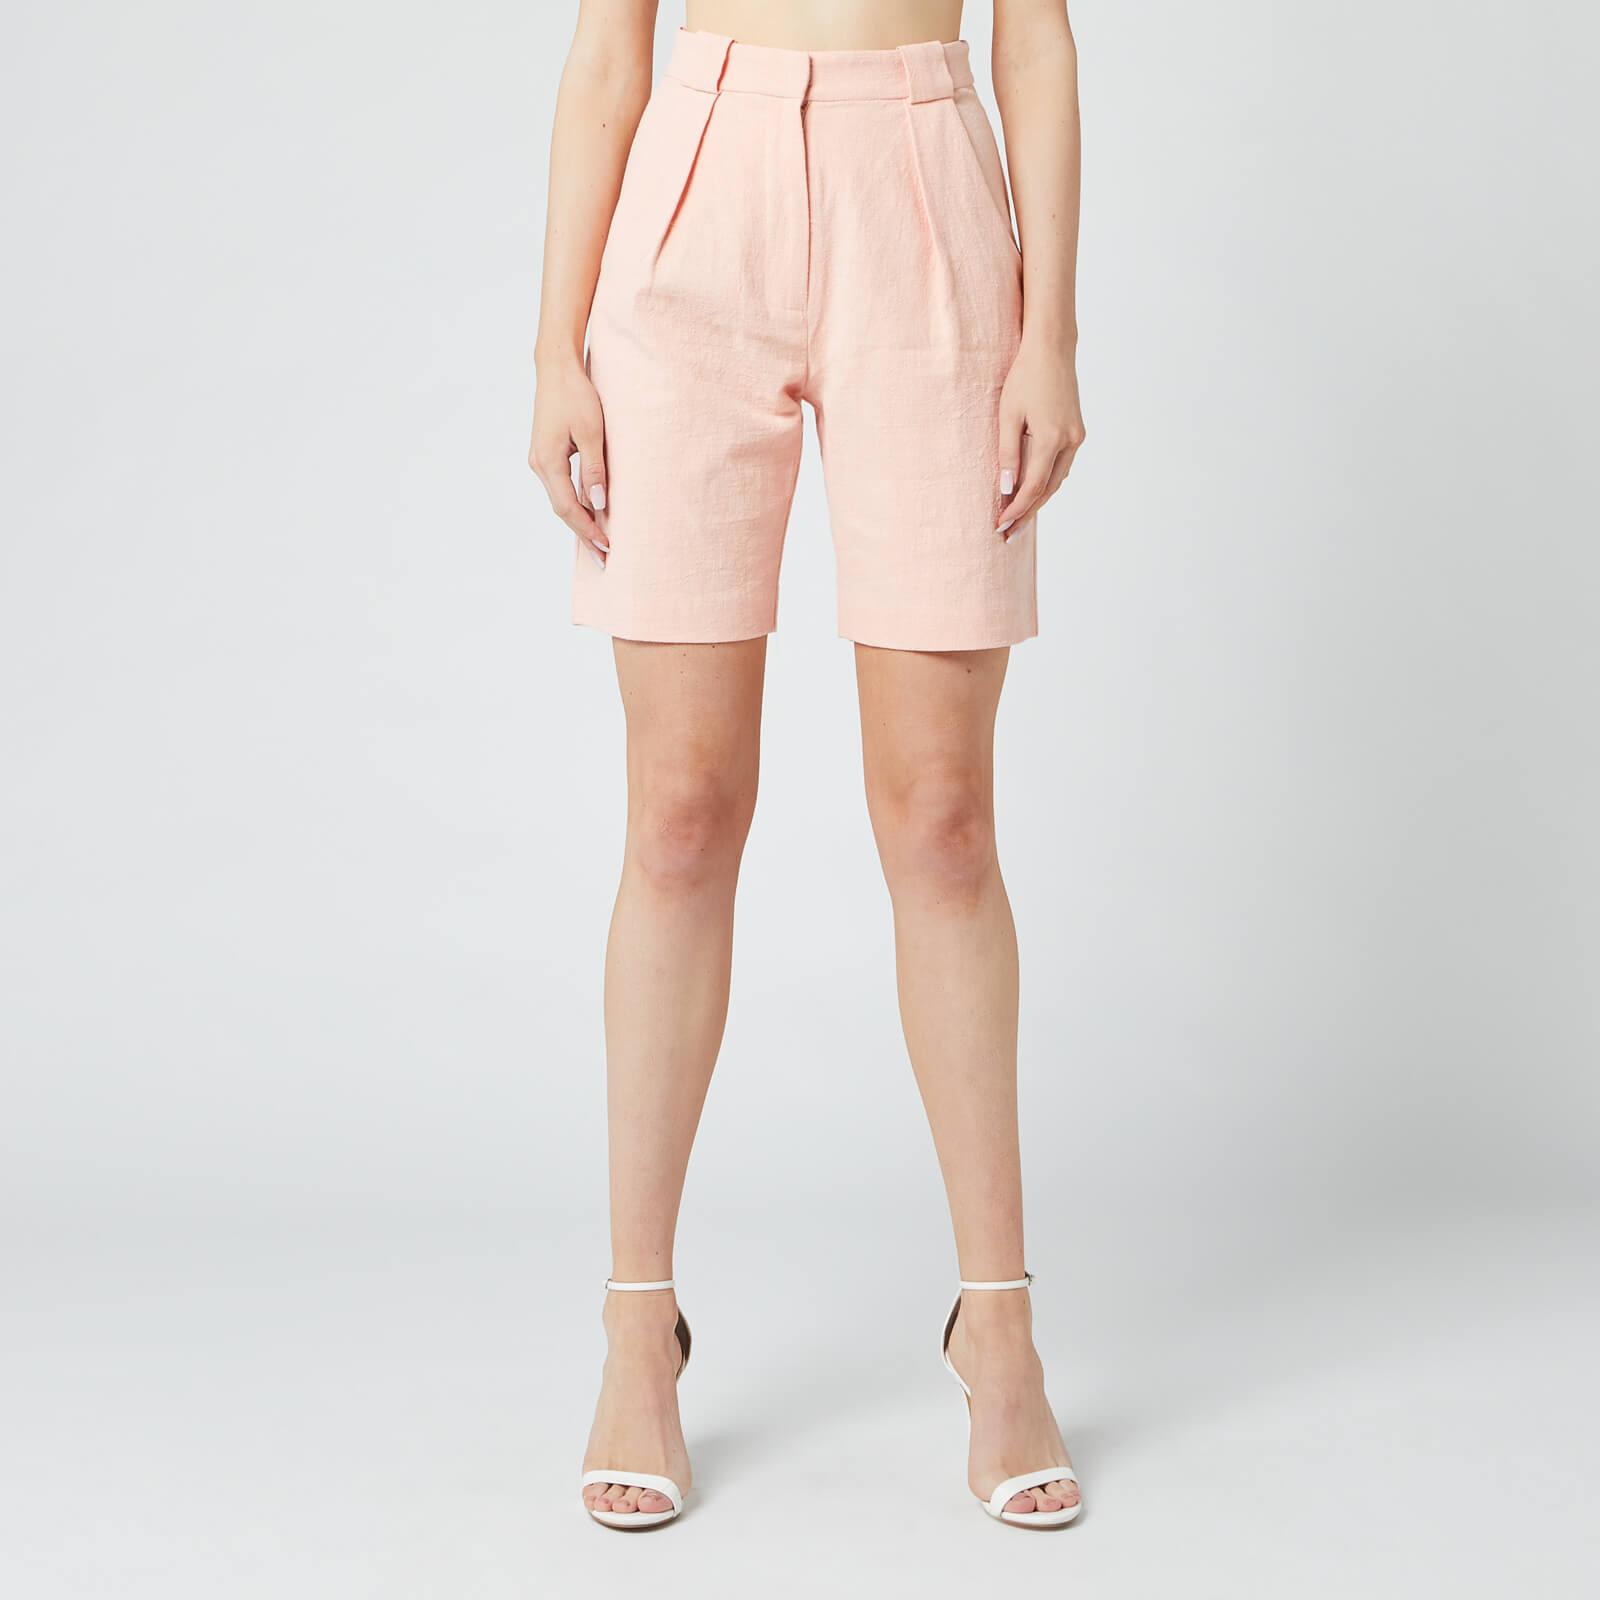 Bec & Bridge Women's Coral Club Shorts - Peach - UK 14